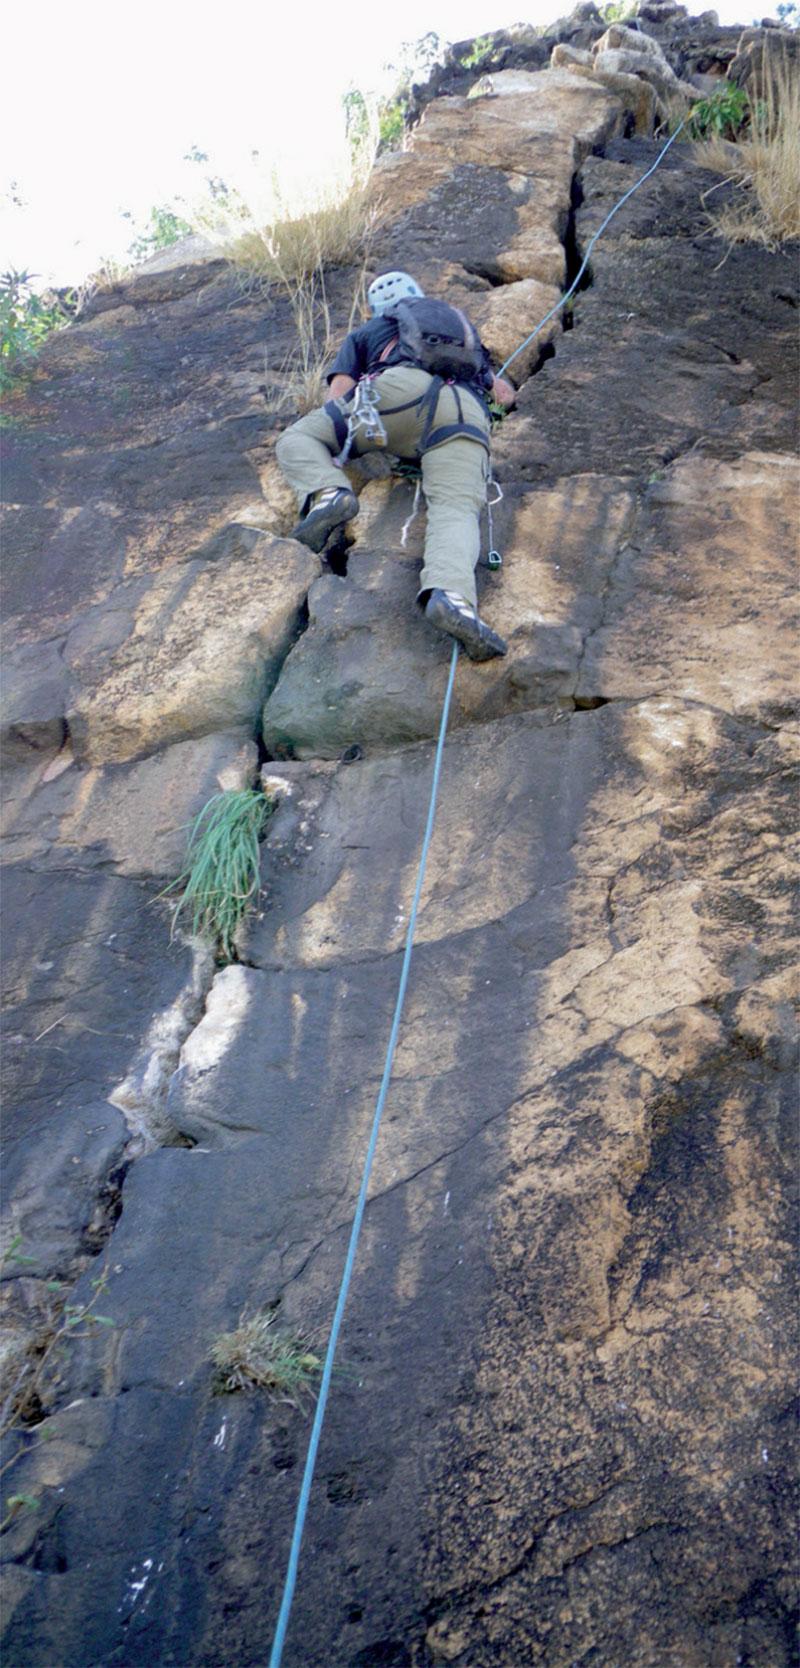 kara-tunga-abim-Rock-Climbing-Uganda-Granite-Ruoth-Amyel-4